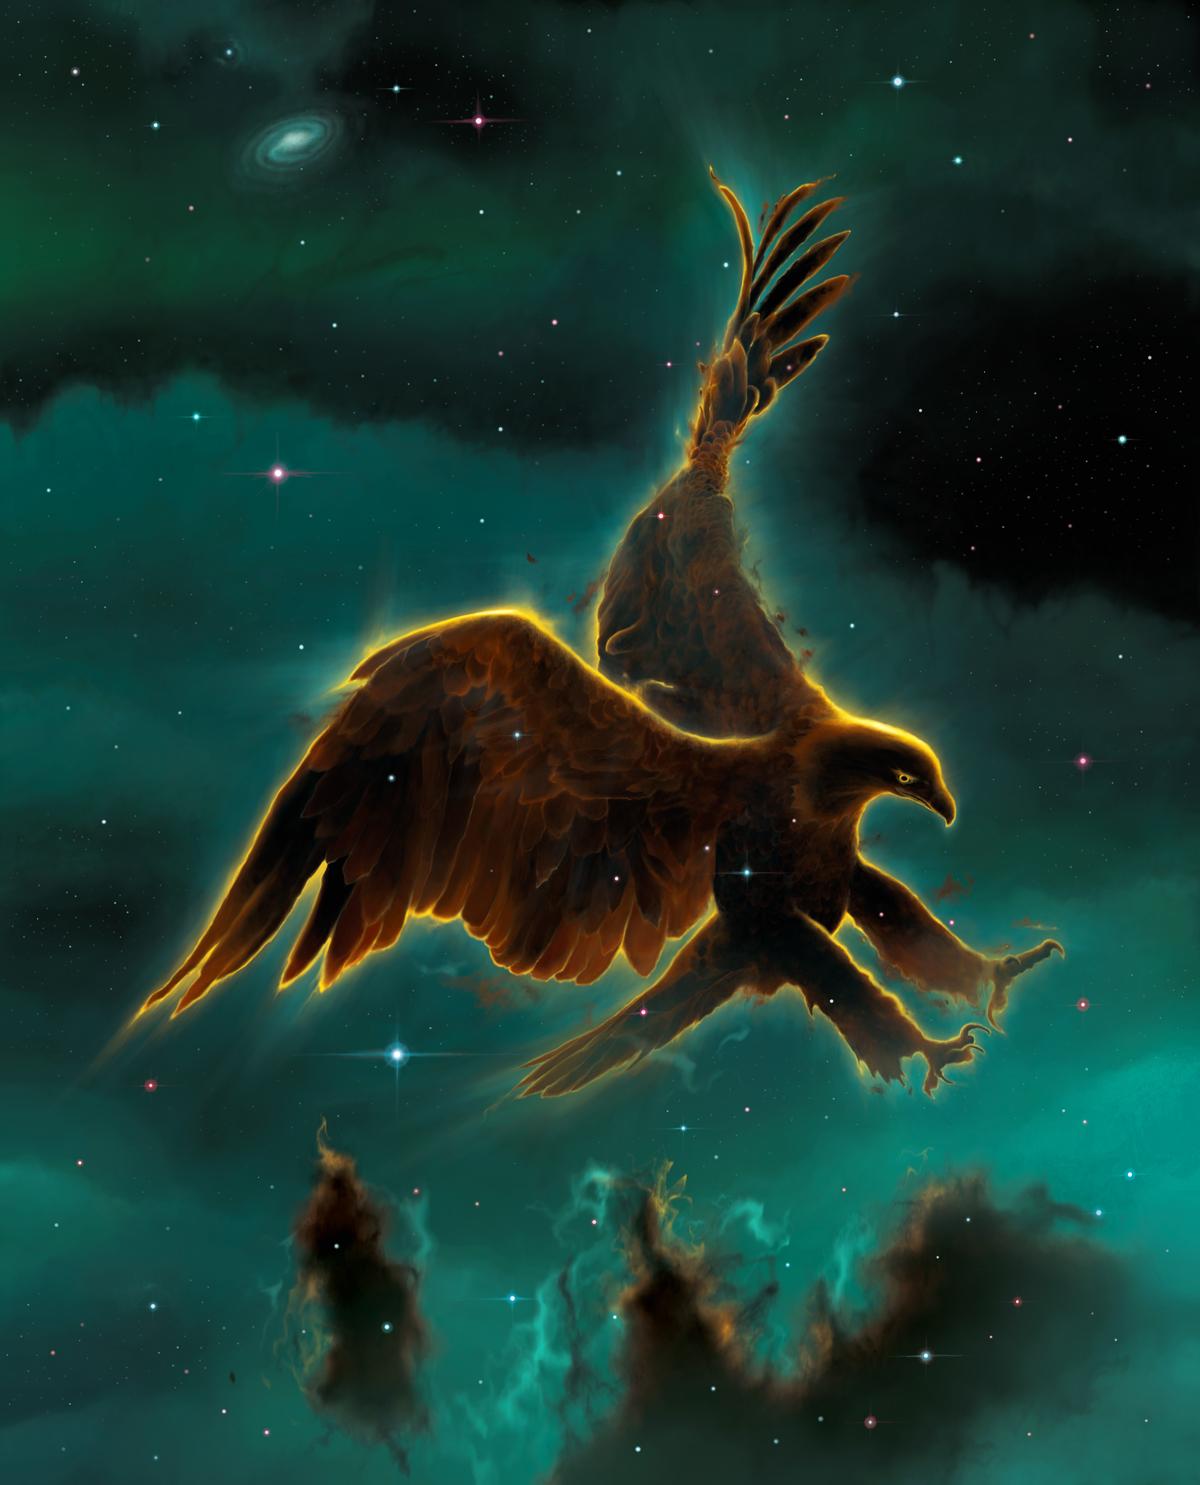 Eagle Nebula by Wallace dans Divers 51a0179e9e8a9873a092ee535a4336f2